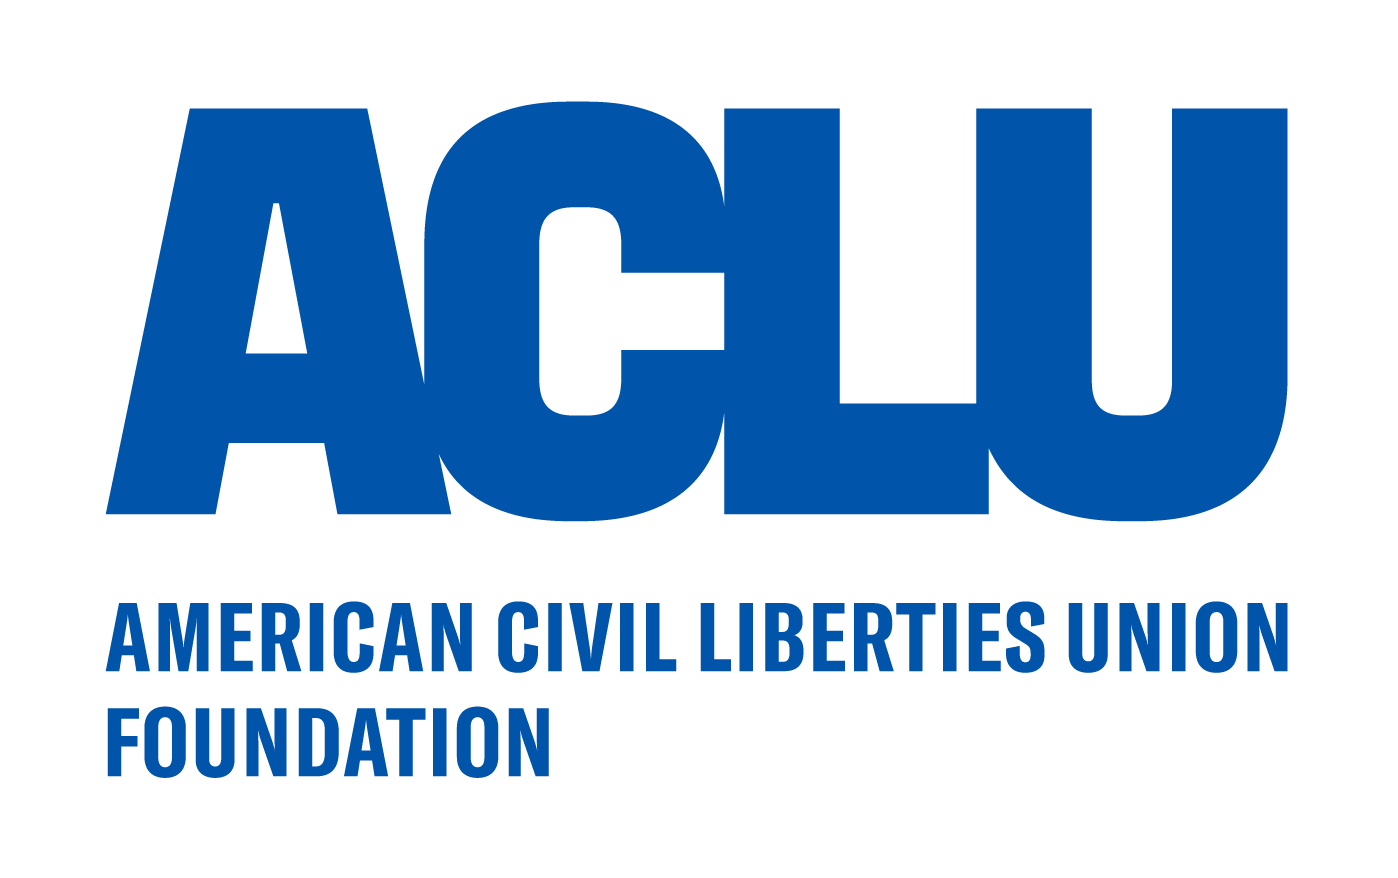 American Civil Liberties Union Foundation (ACLU).